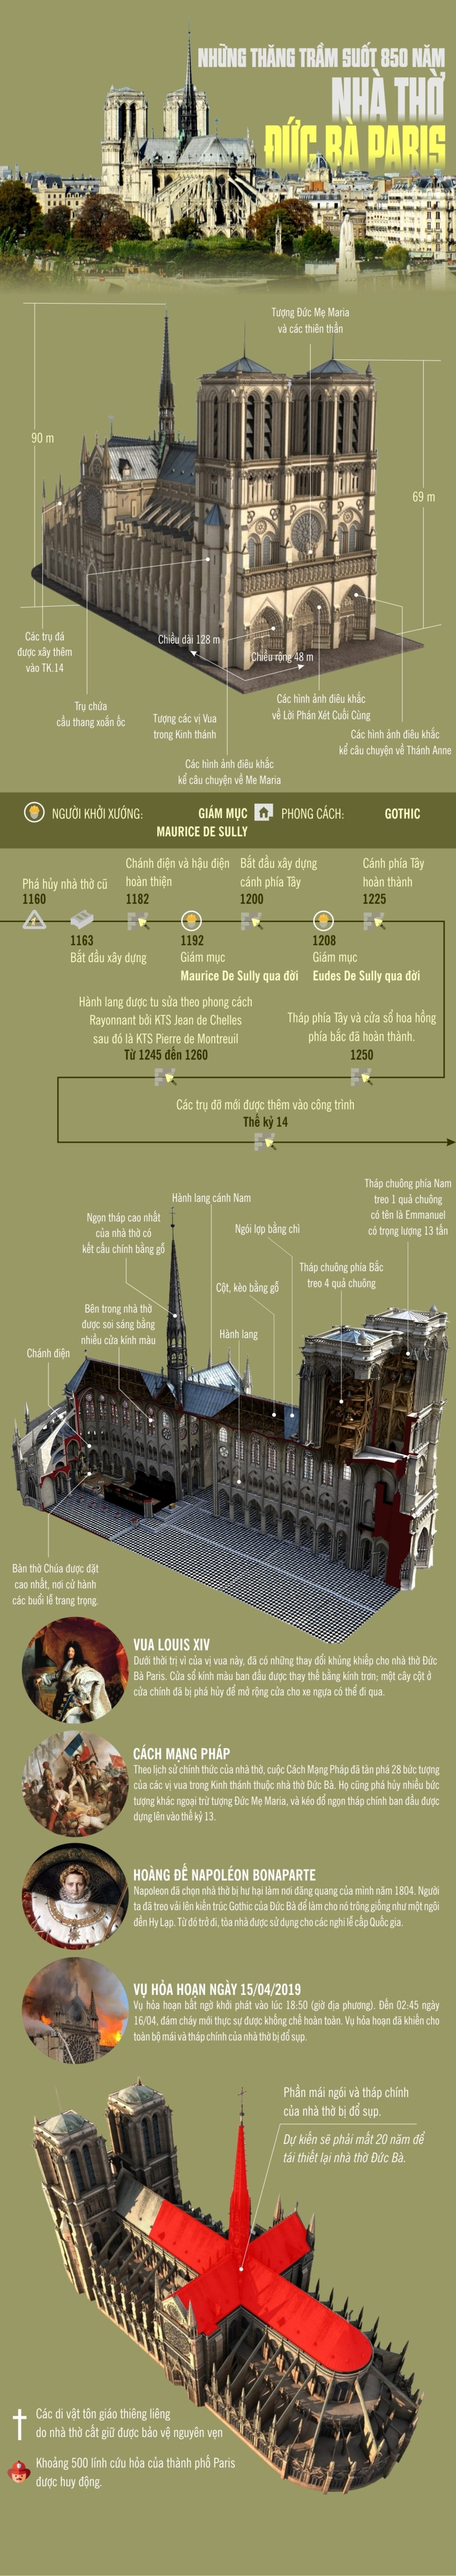 Infographic: Nhung thang tram suot 850 nam cua Nha tho Duc Ba Paris